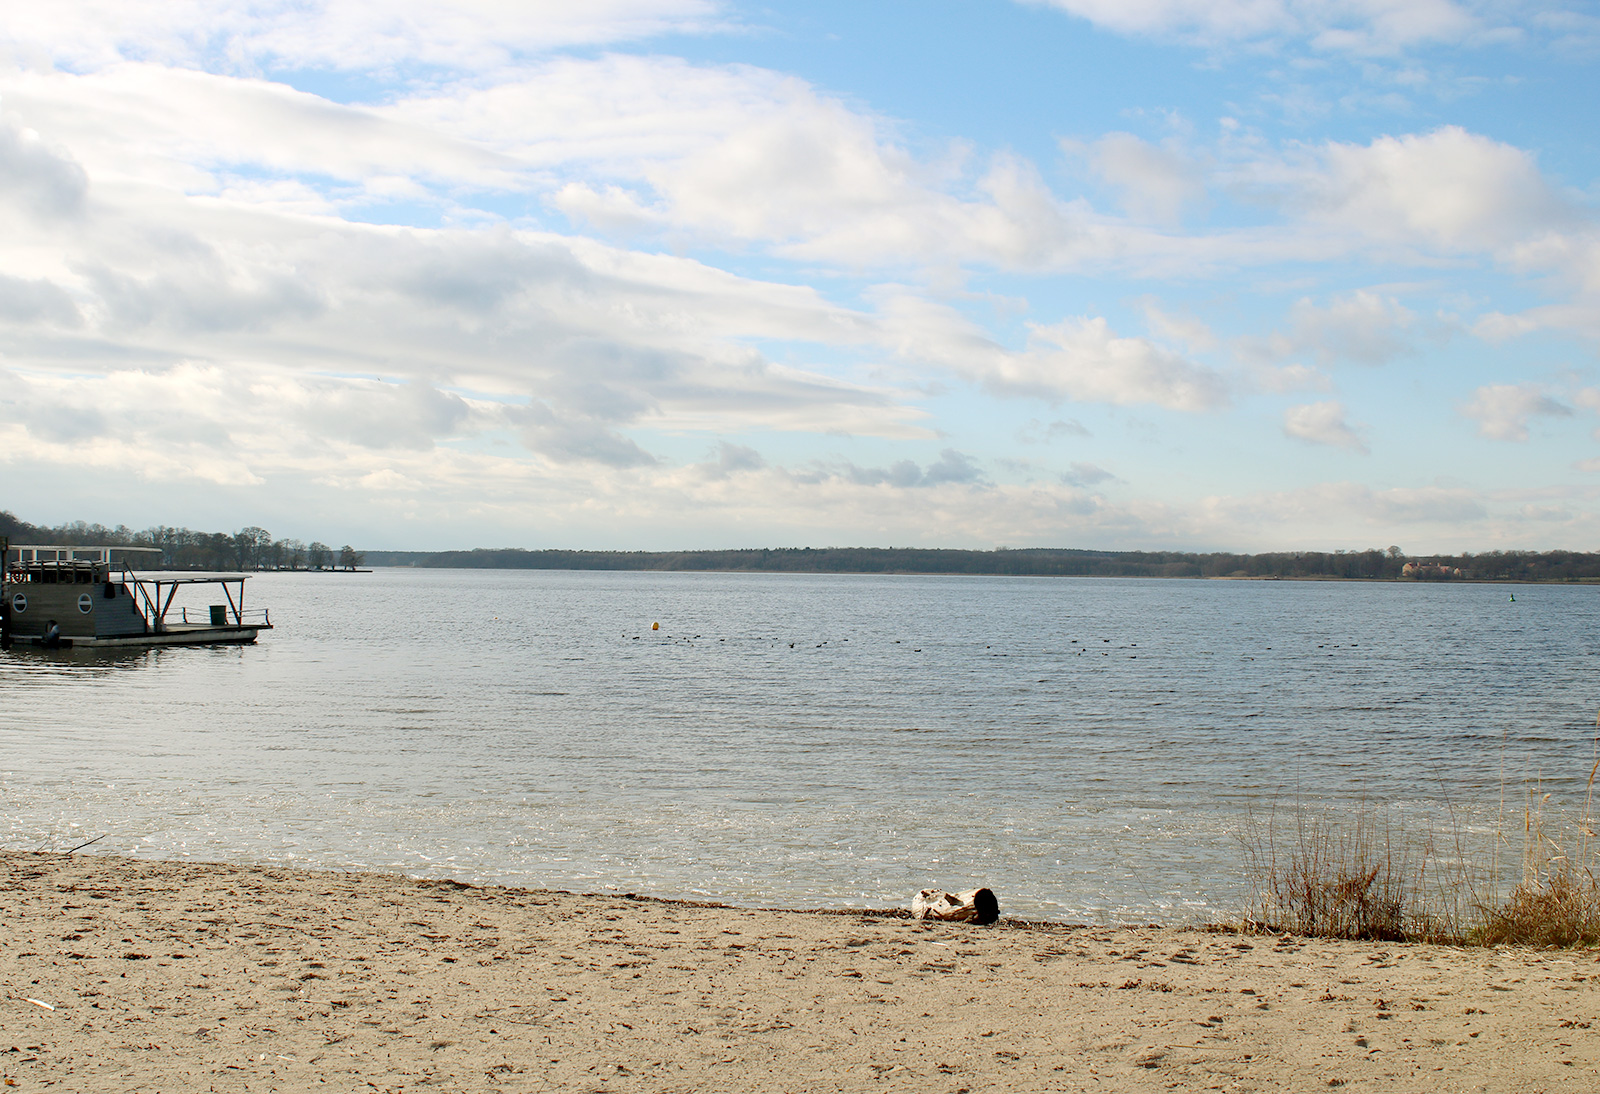 Caputh Position 2 Strandbad